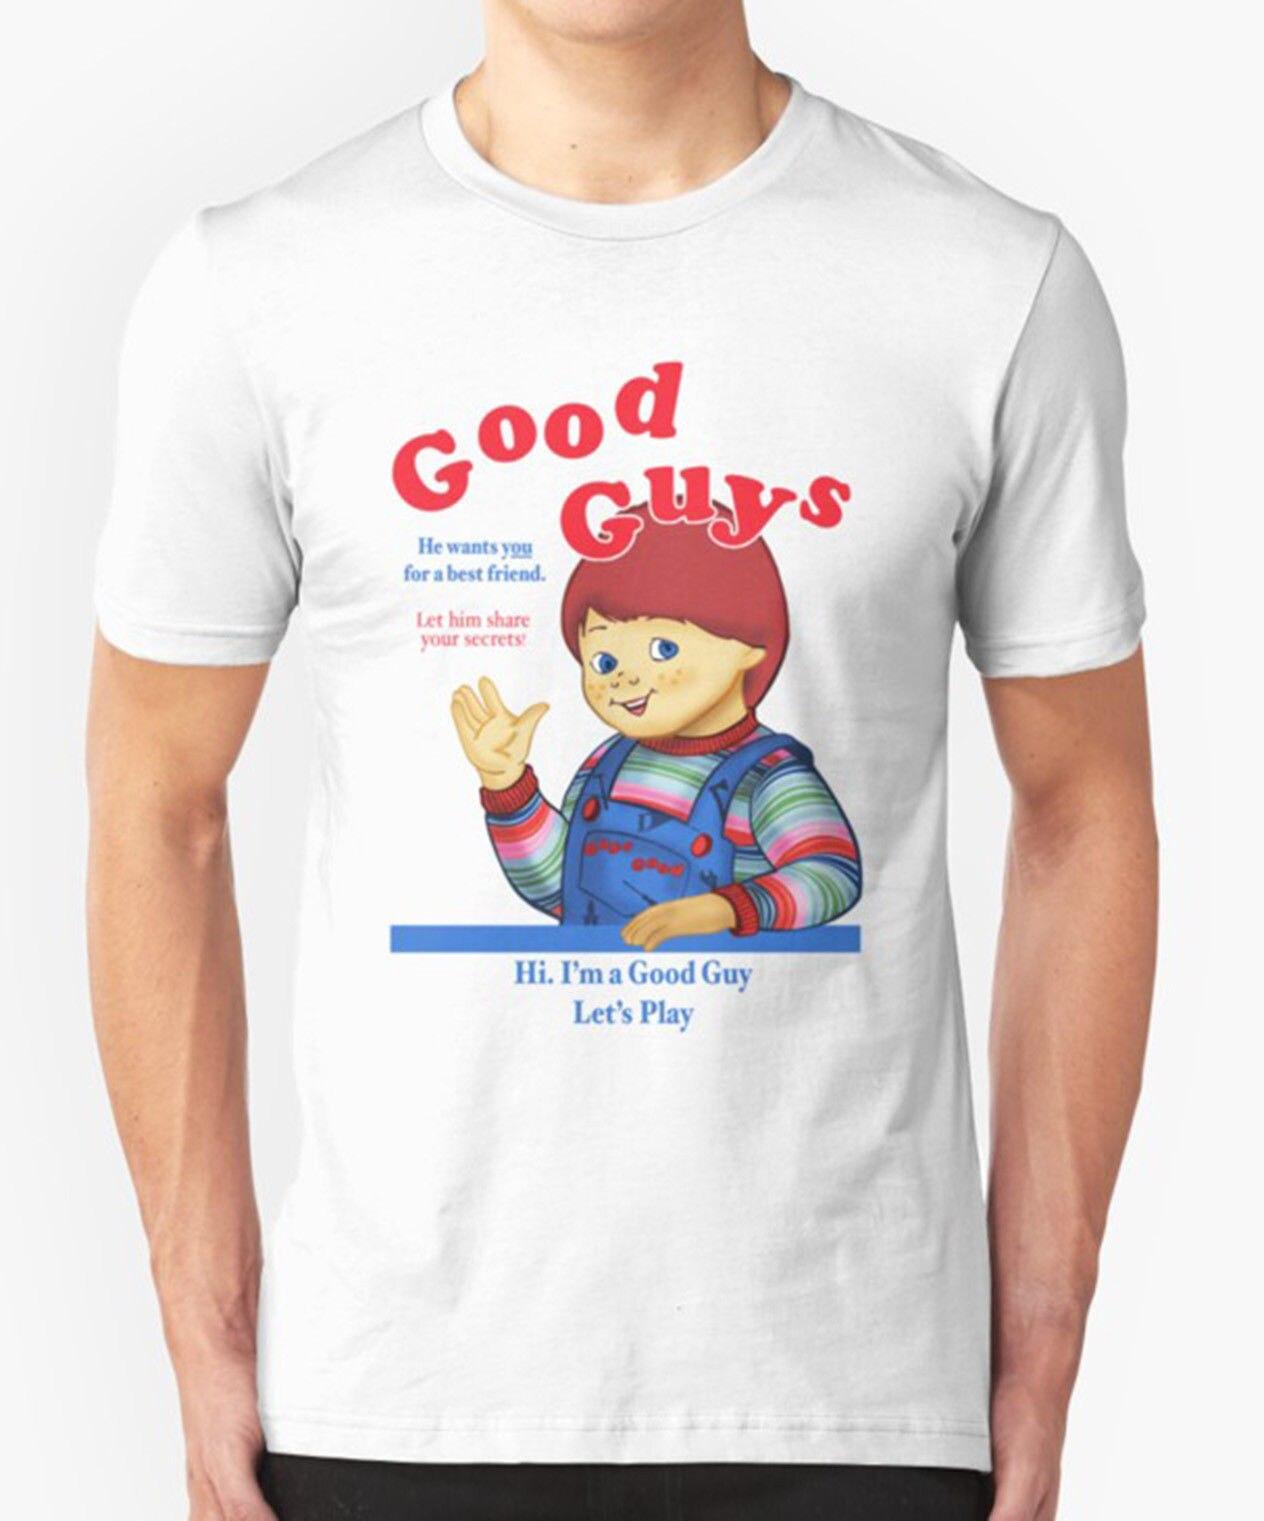 GOOD GUYS T SHIRT CHUCKY CHILDSPLAY HORROR CULT S MOVIE FILM - Good guy shirt